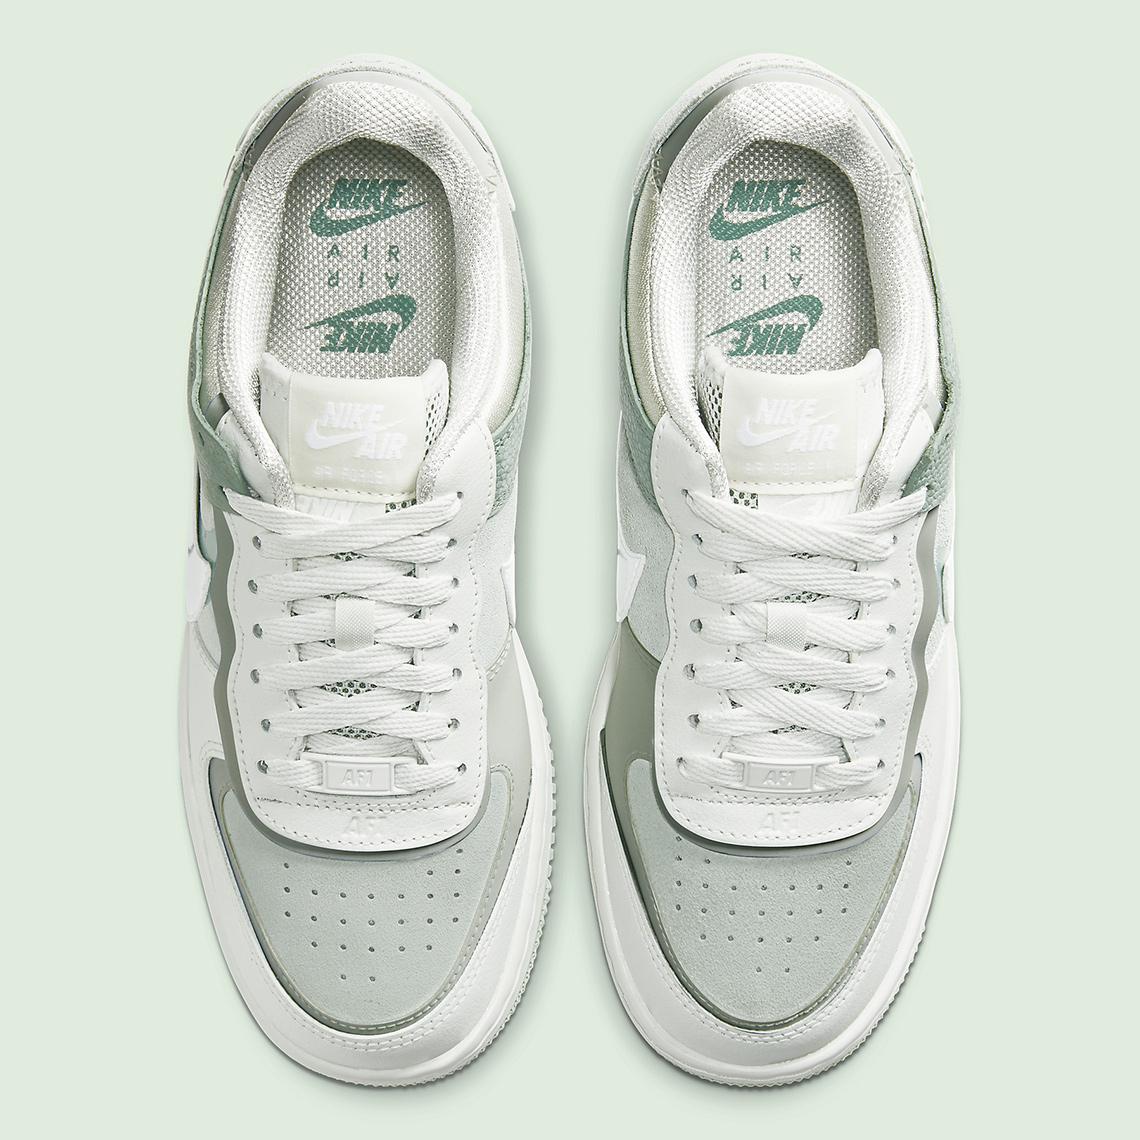 Nike Air Force 1 Shadow Spruce Aura Cw2655 001 Release Info Sneakernews Com Кожа, синтетика, текстиль, пластик, резина. nike air force 1 shadow spruce aura